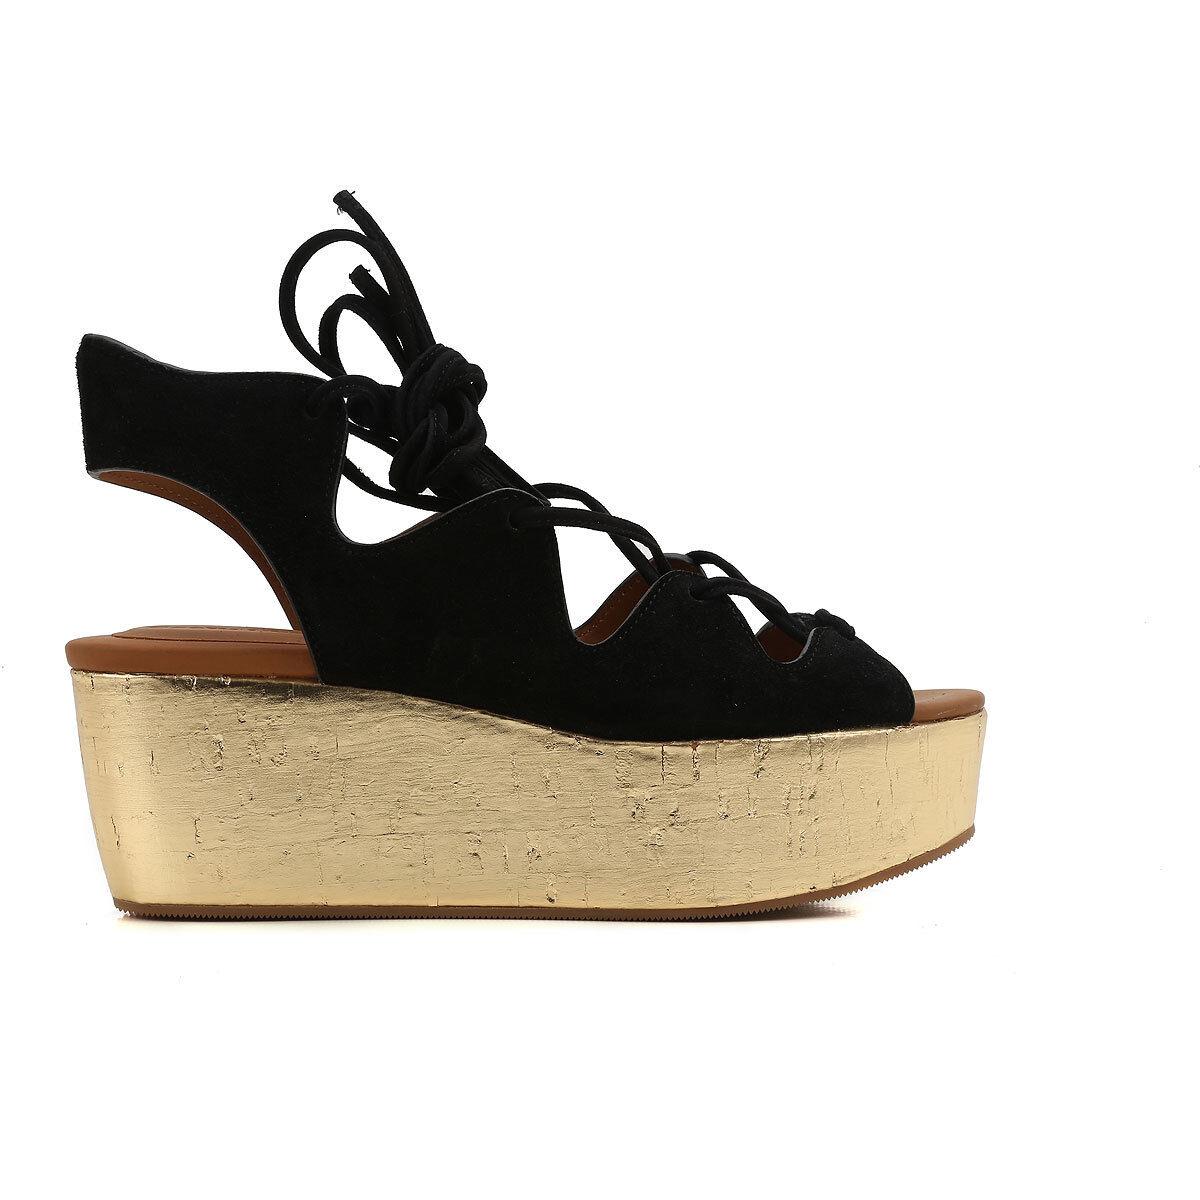 See by Chloè Sandalo Liana, Liana wedge sandal